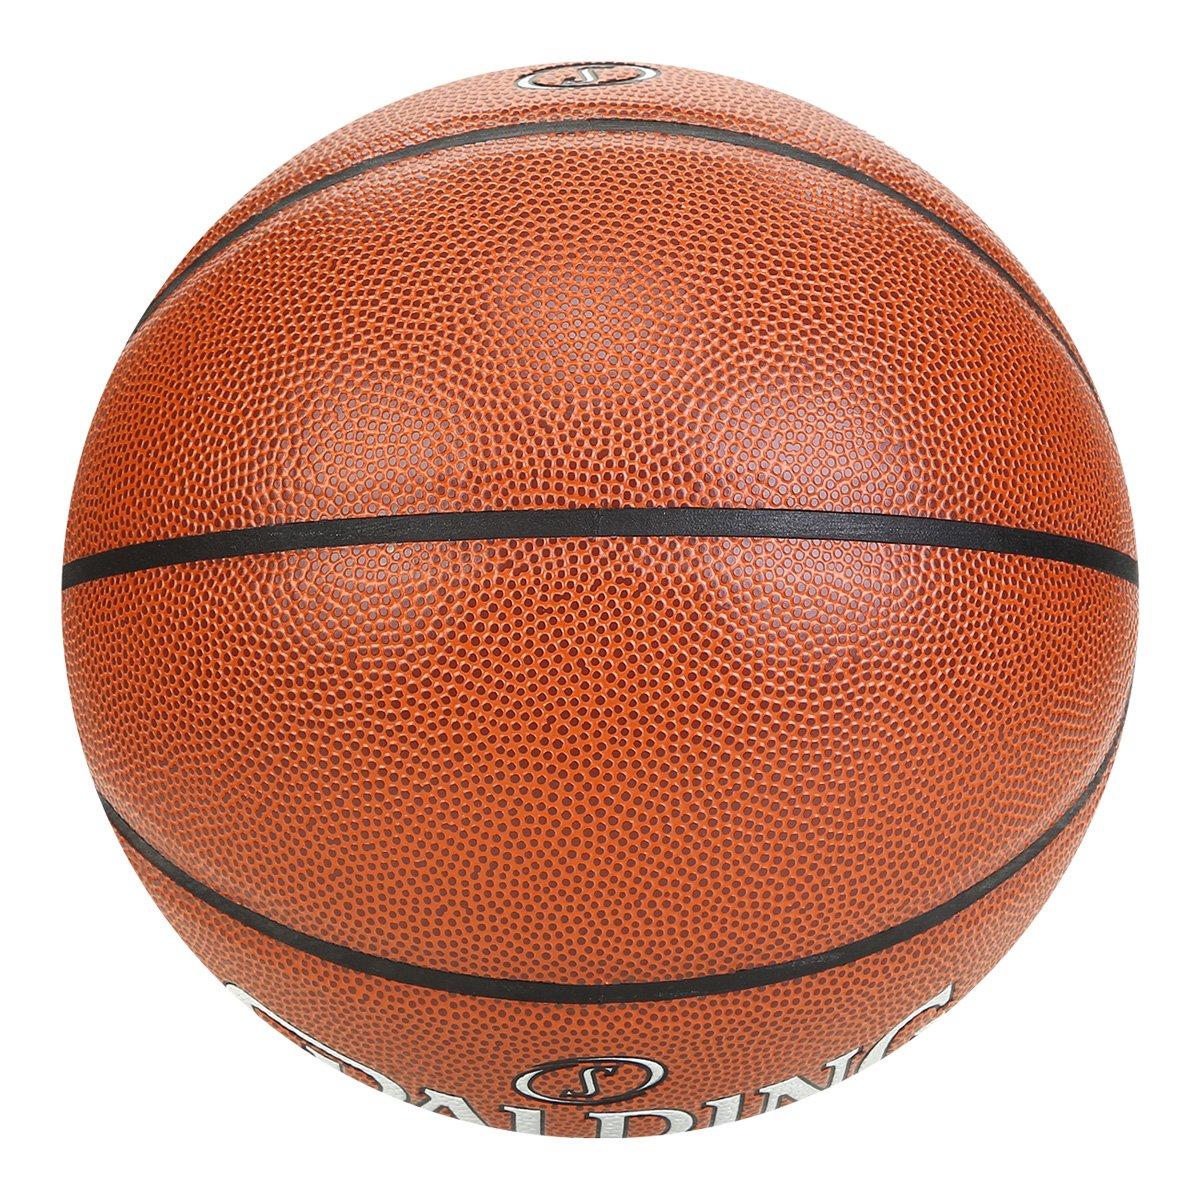 Bola de Basquete Spalding 2015 Jr Composite Tam 6 - 2